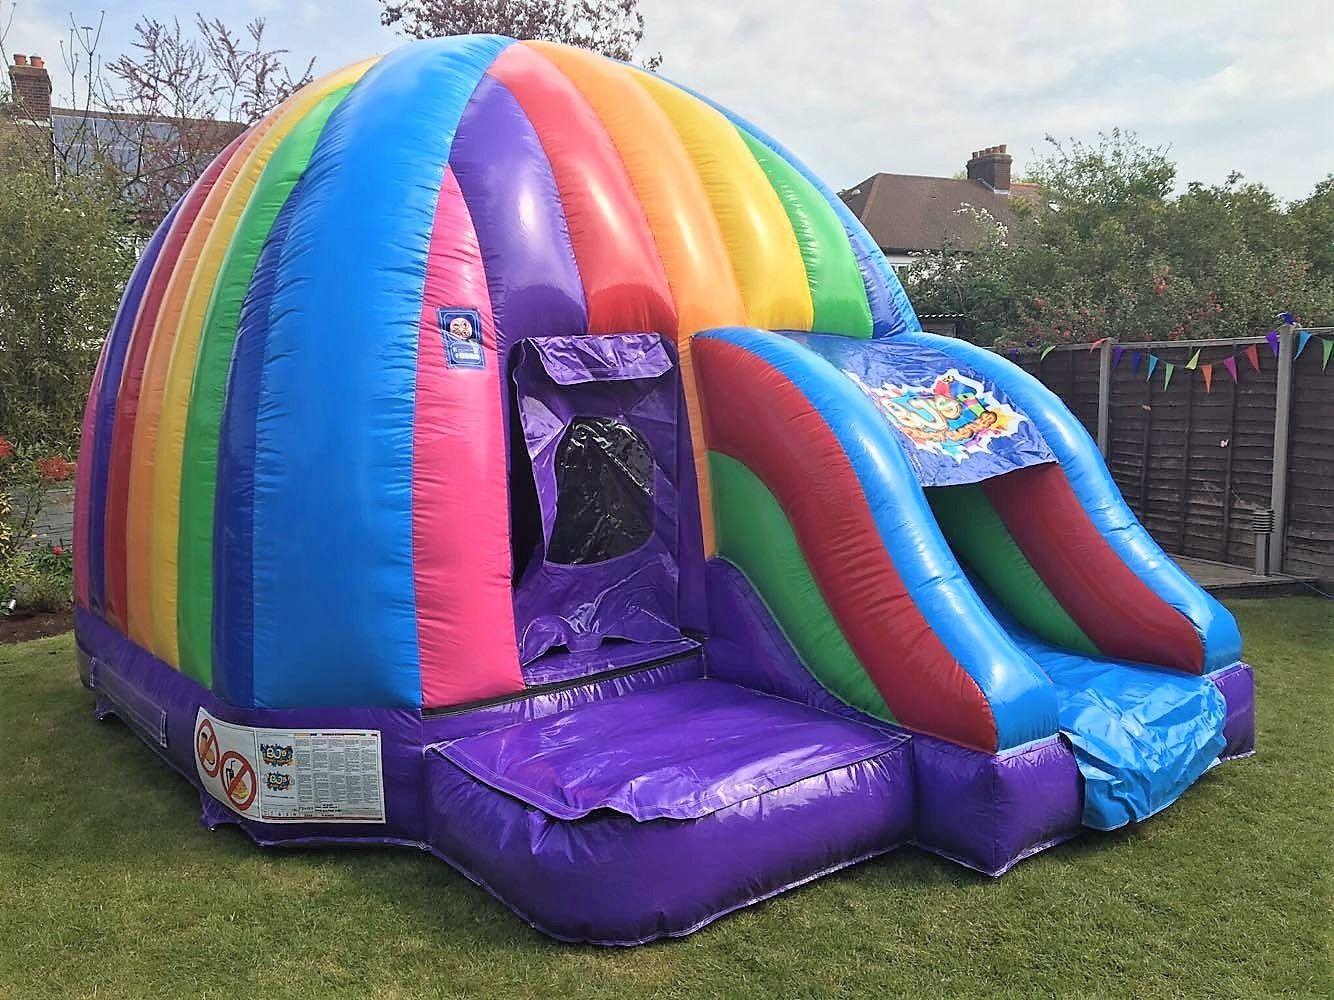 Quatang Gallery- Disco Bouncy Castle Hire Bexley Disco Hire Hall Hire Bexley Disco Bouncy Castle Bouncy Castle Hire Bouncy Castle